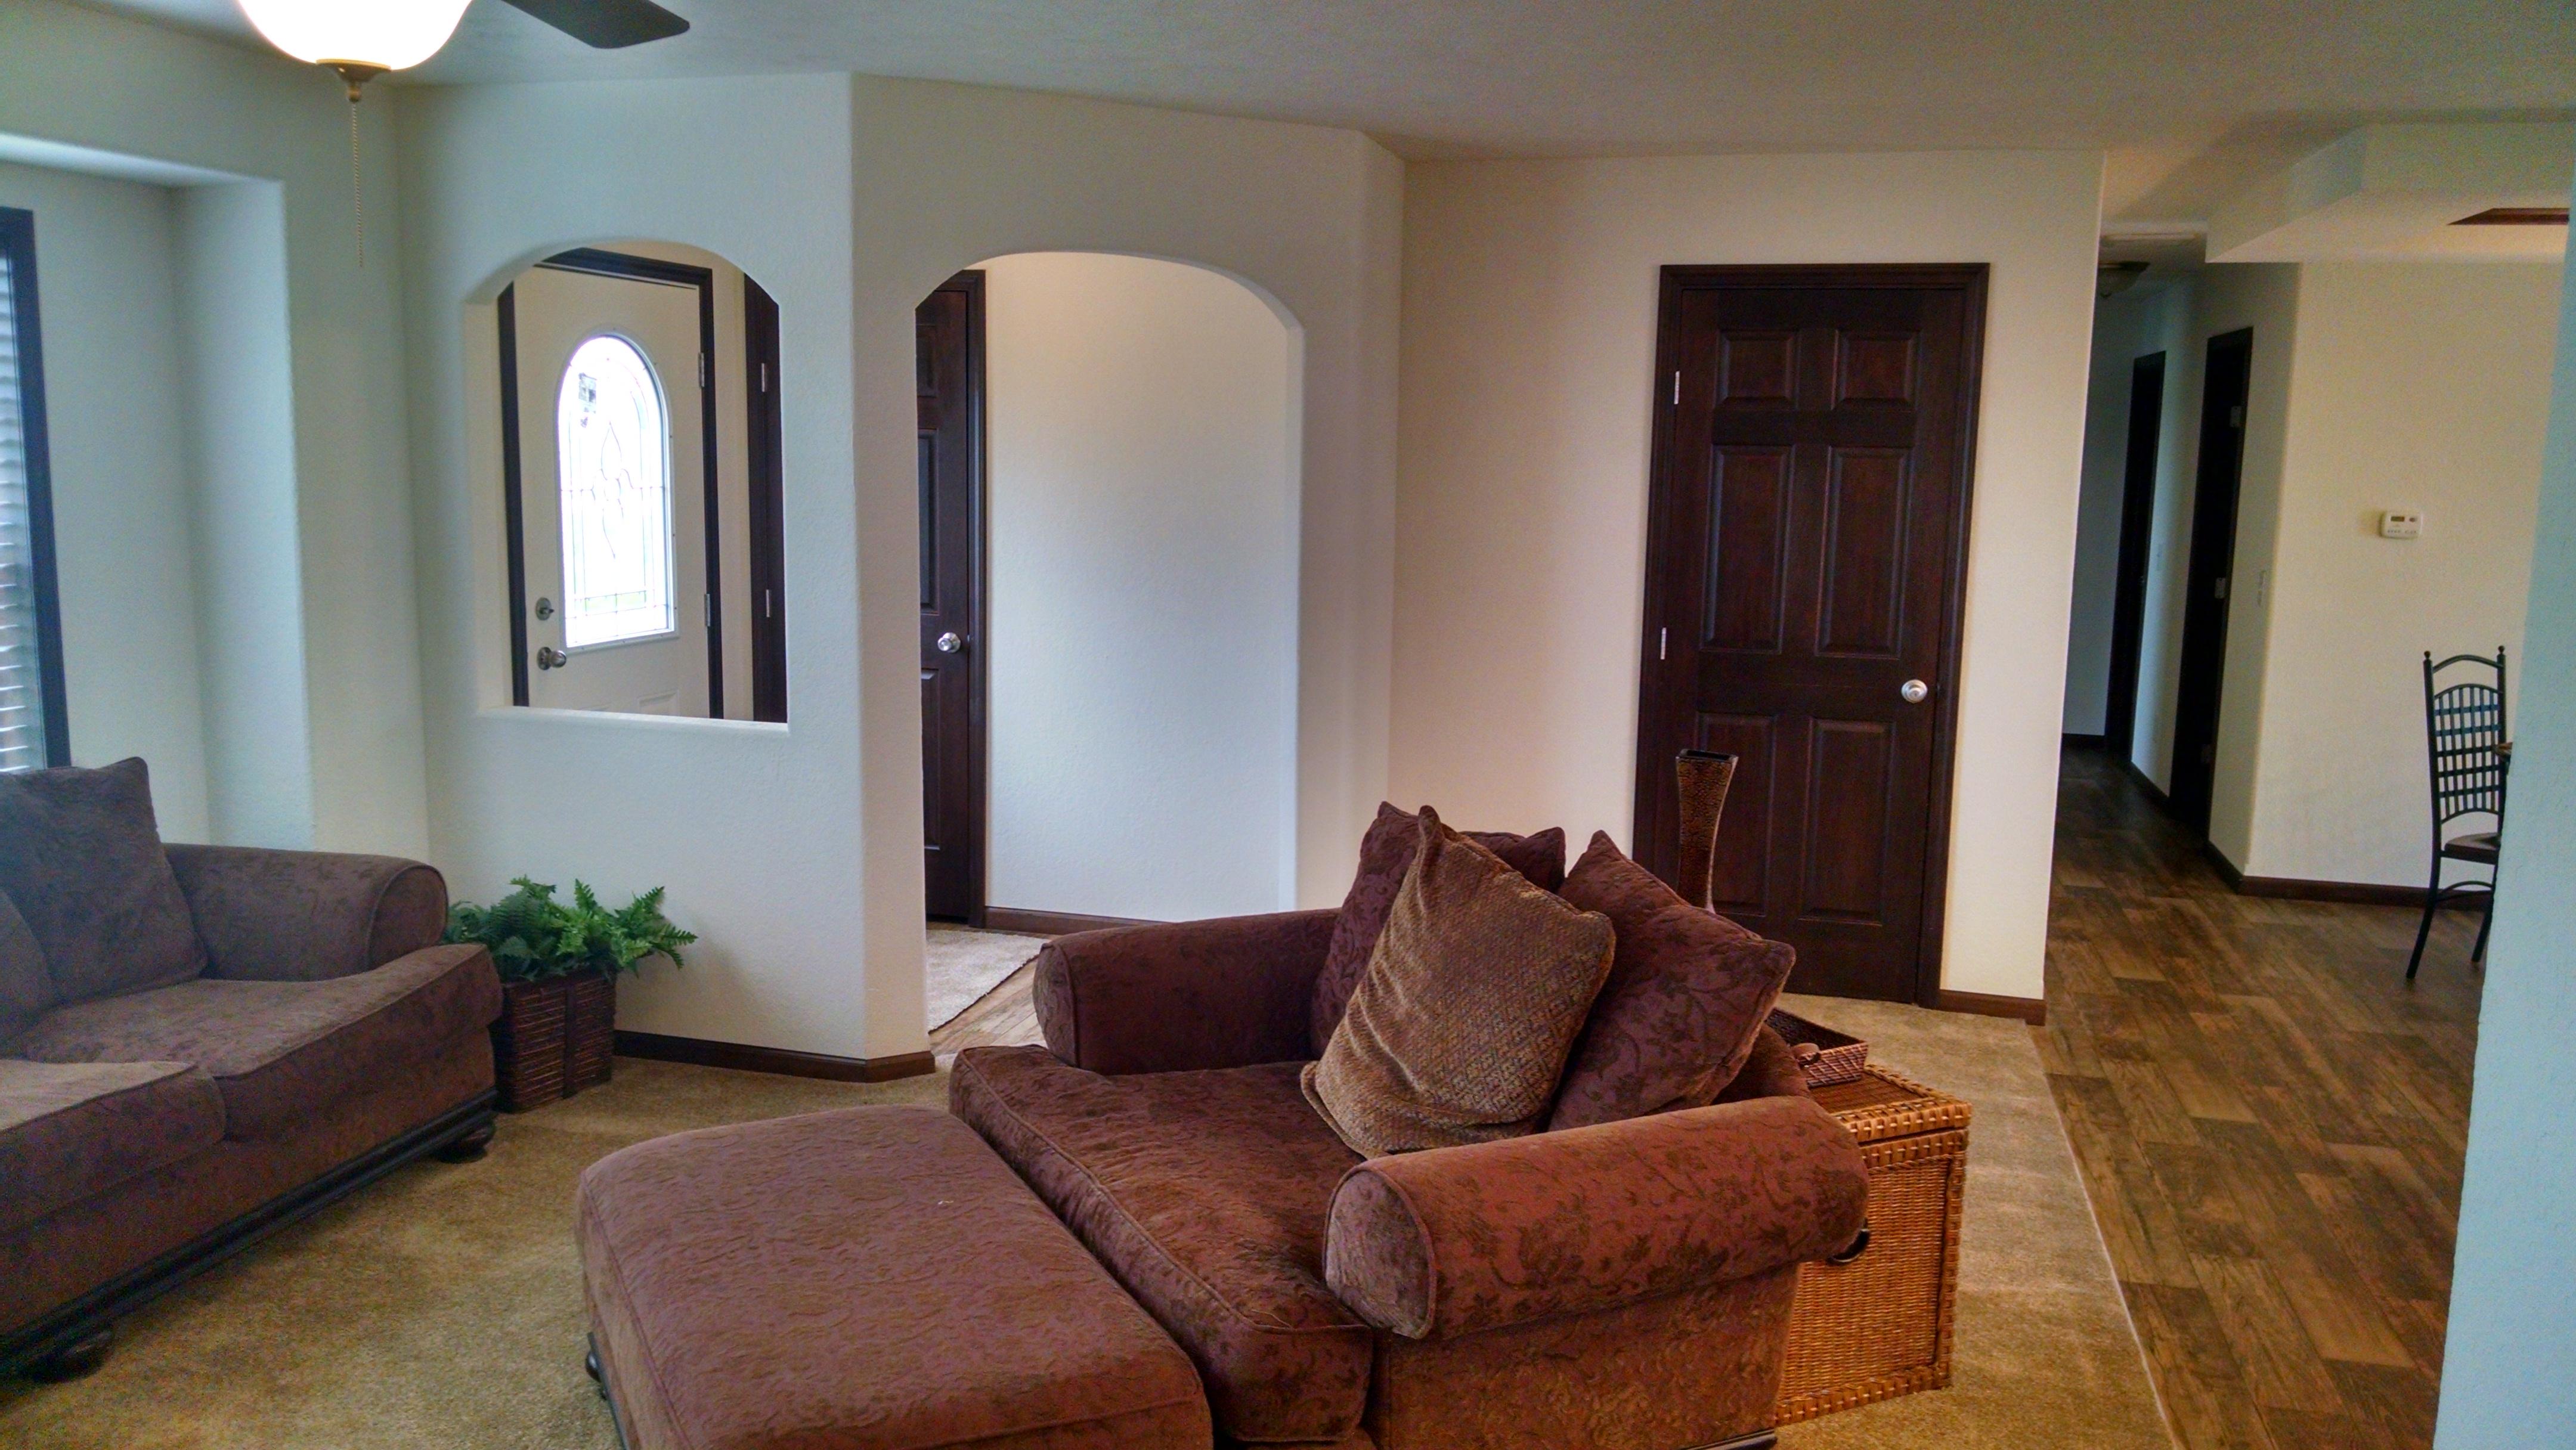 Arched Foyer w/ Coat Closet